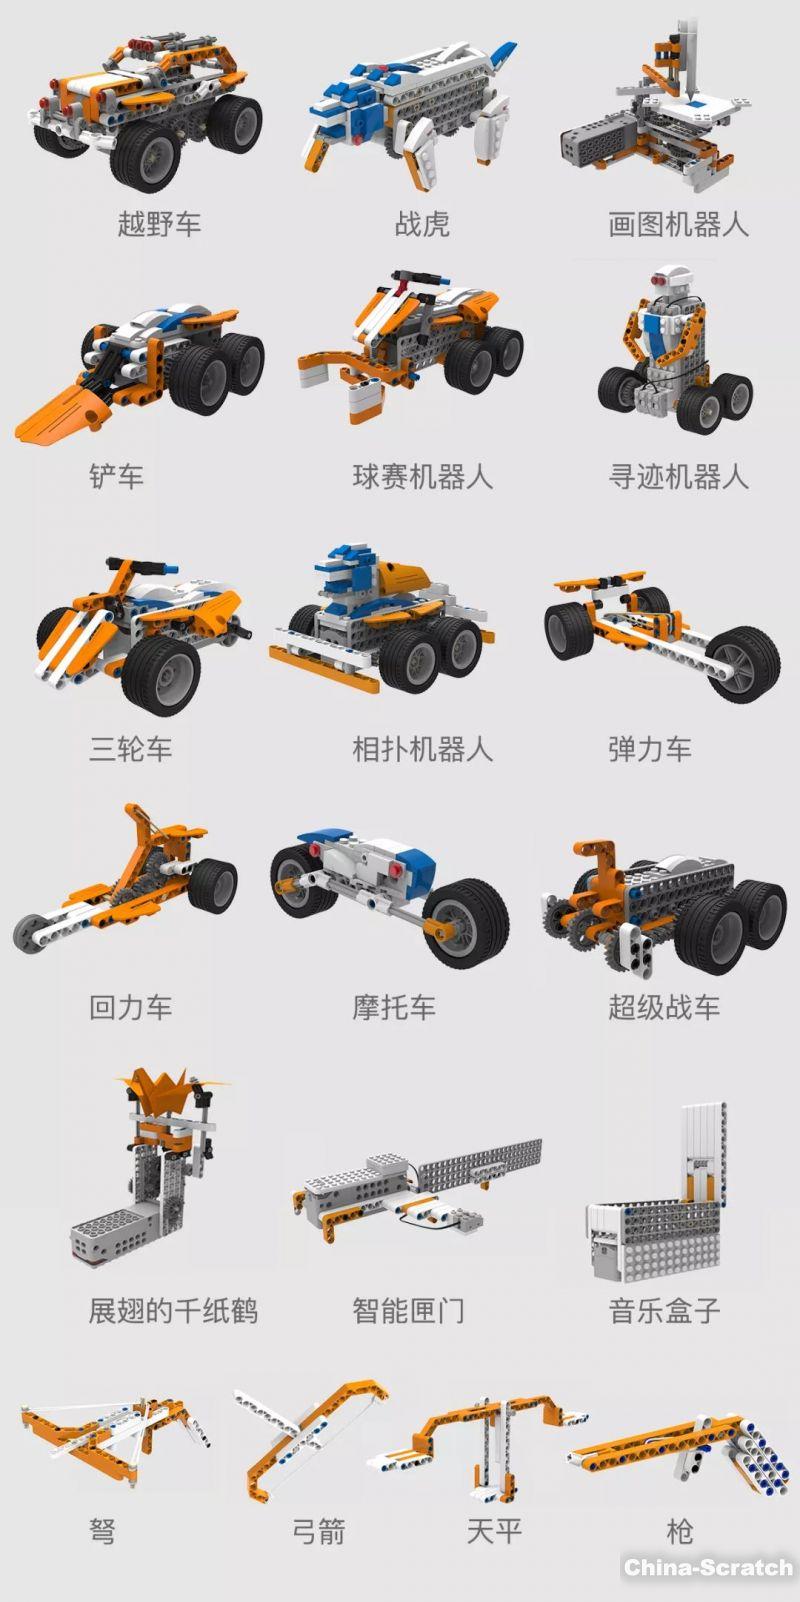 https://www.china-scratch.com/Uploads/timg/190514/1113055109-17.jpg